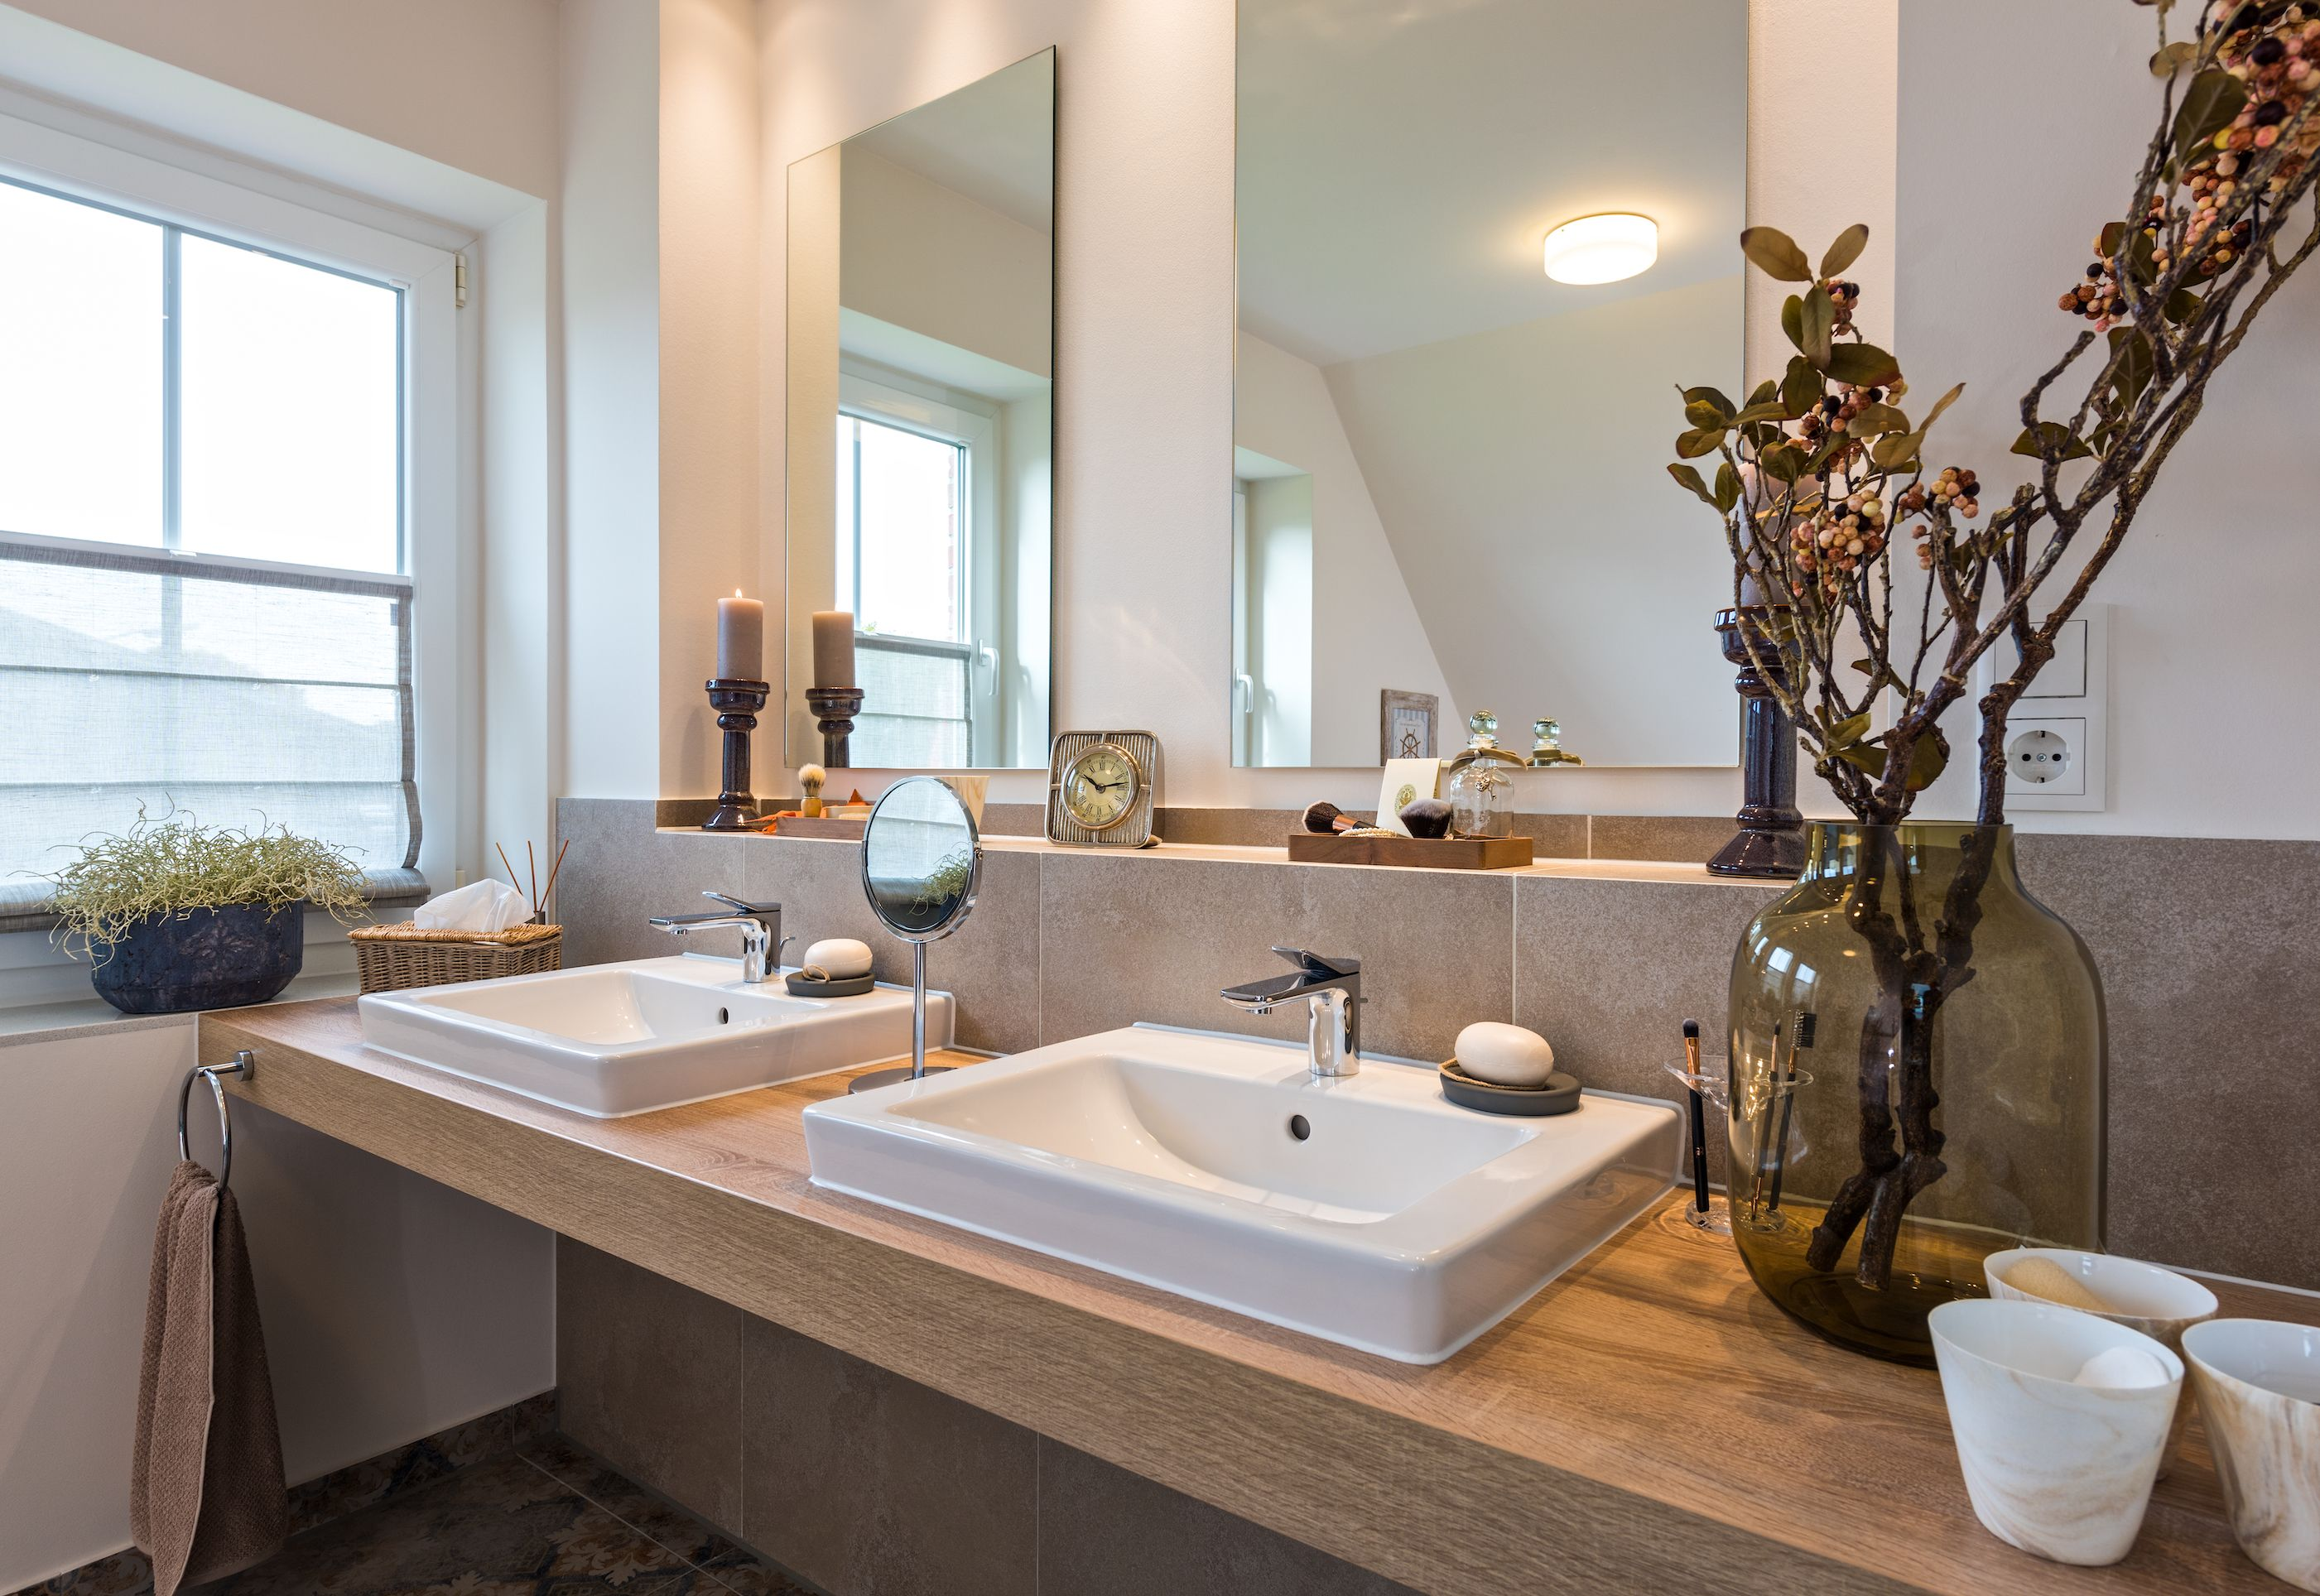 Badezimmer Viebrockhaus Musterhauspark Badezimmer Badezimmerideen Neues Badezimmer